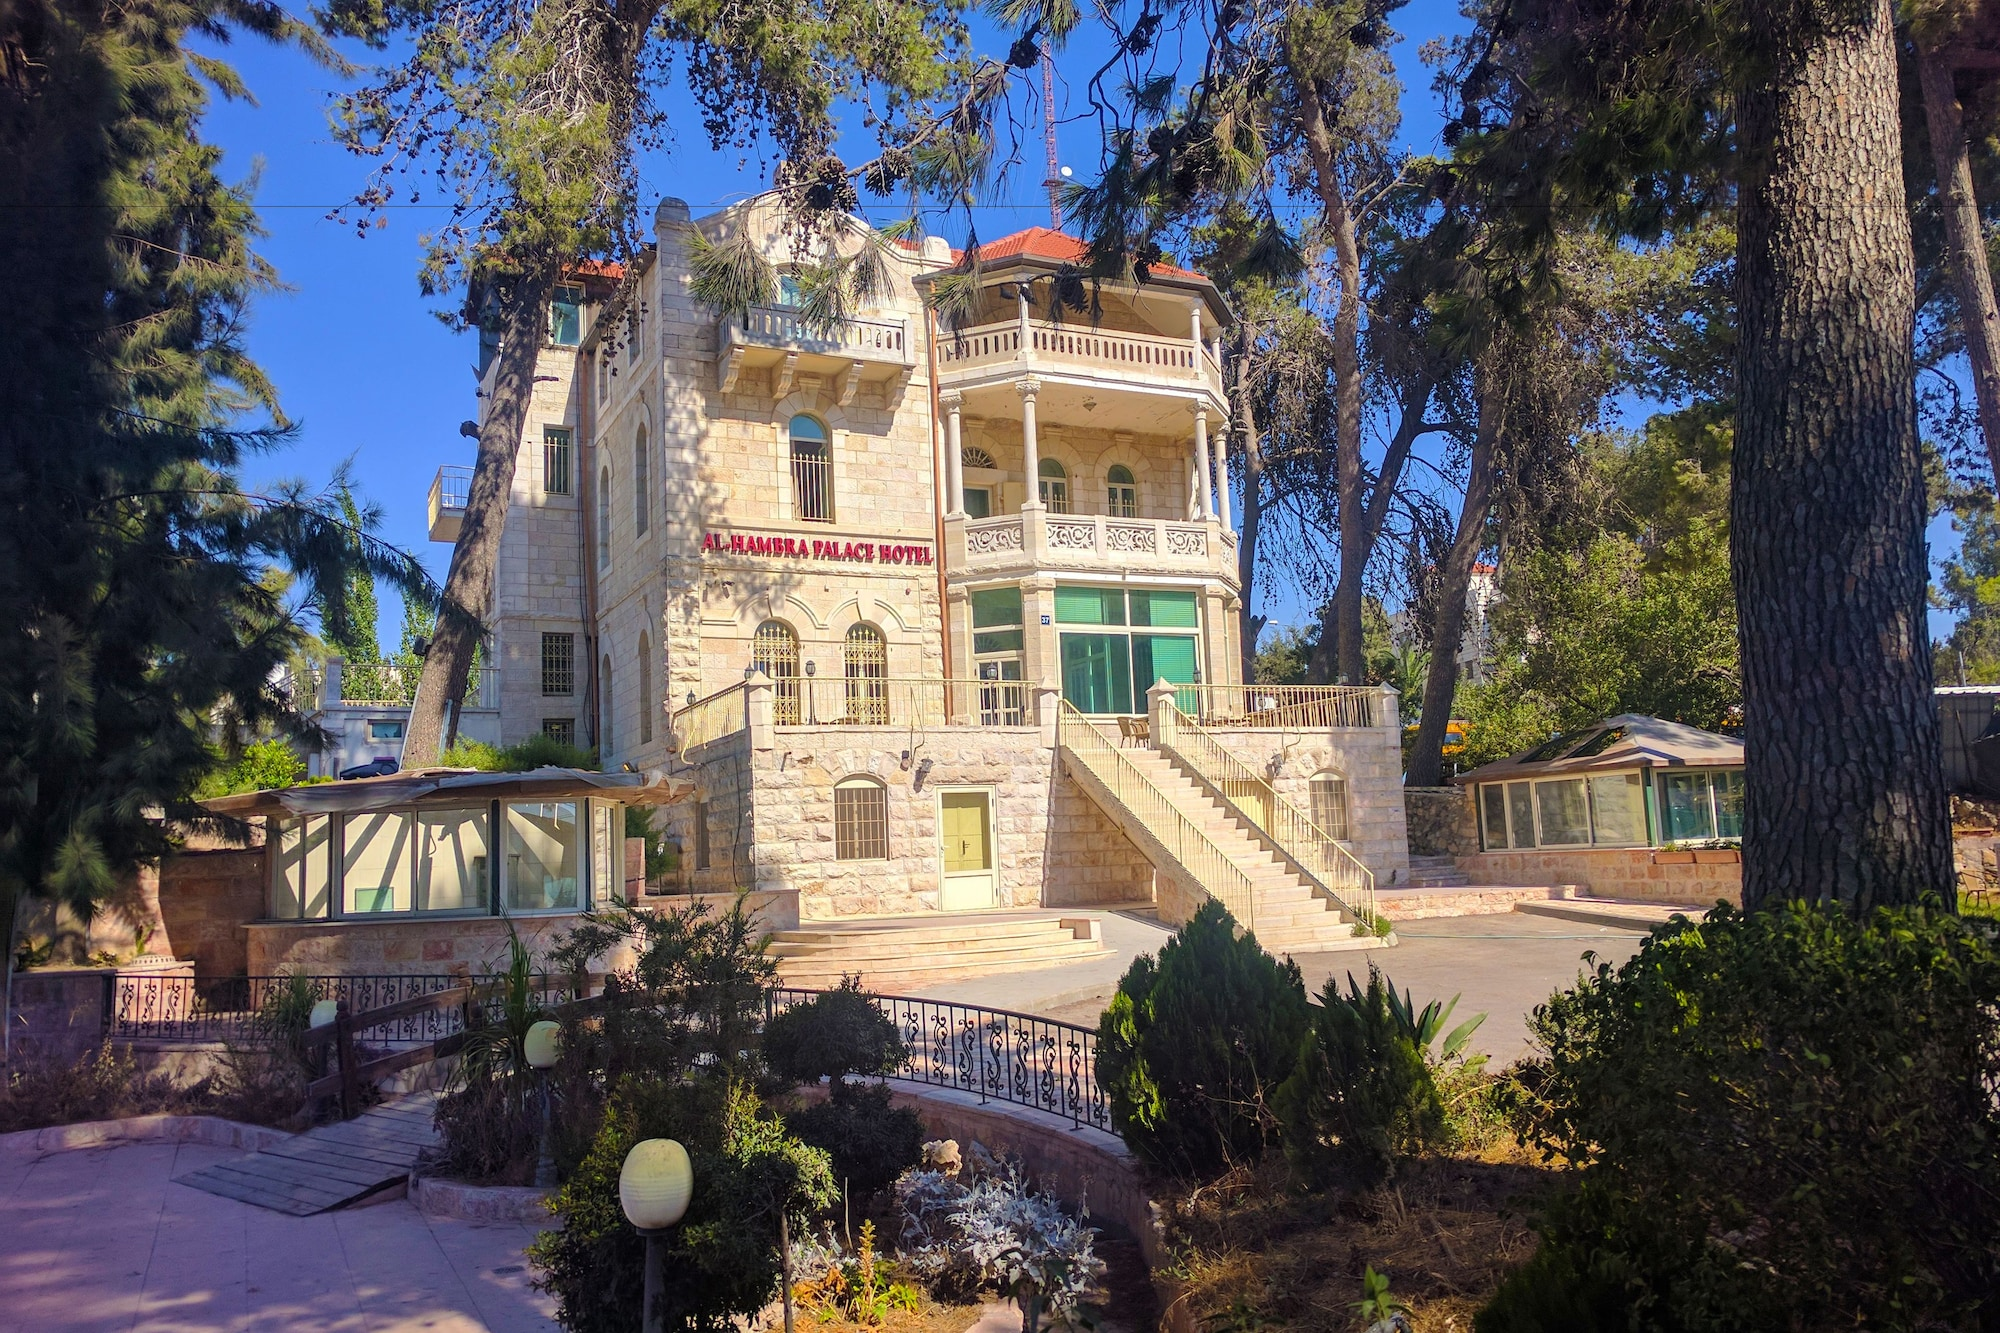 Alhambra Palace Hotel Suites & Resort, Ramallah and Al-Bireh